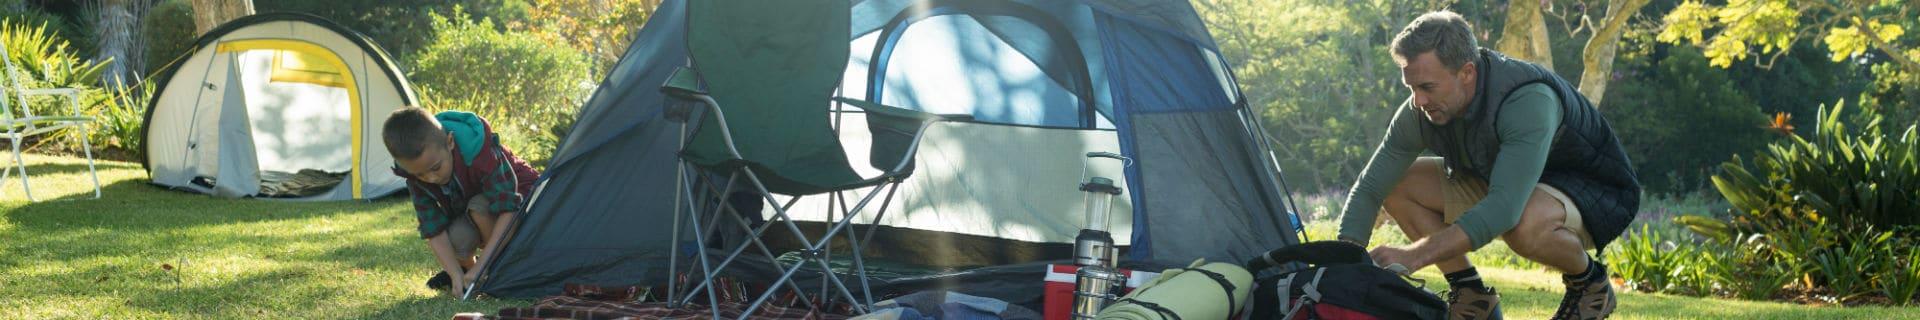 Seven amazing camping hacks